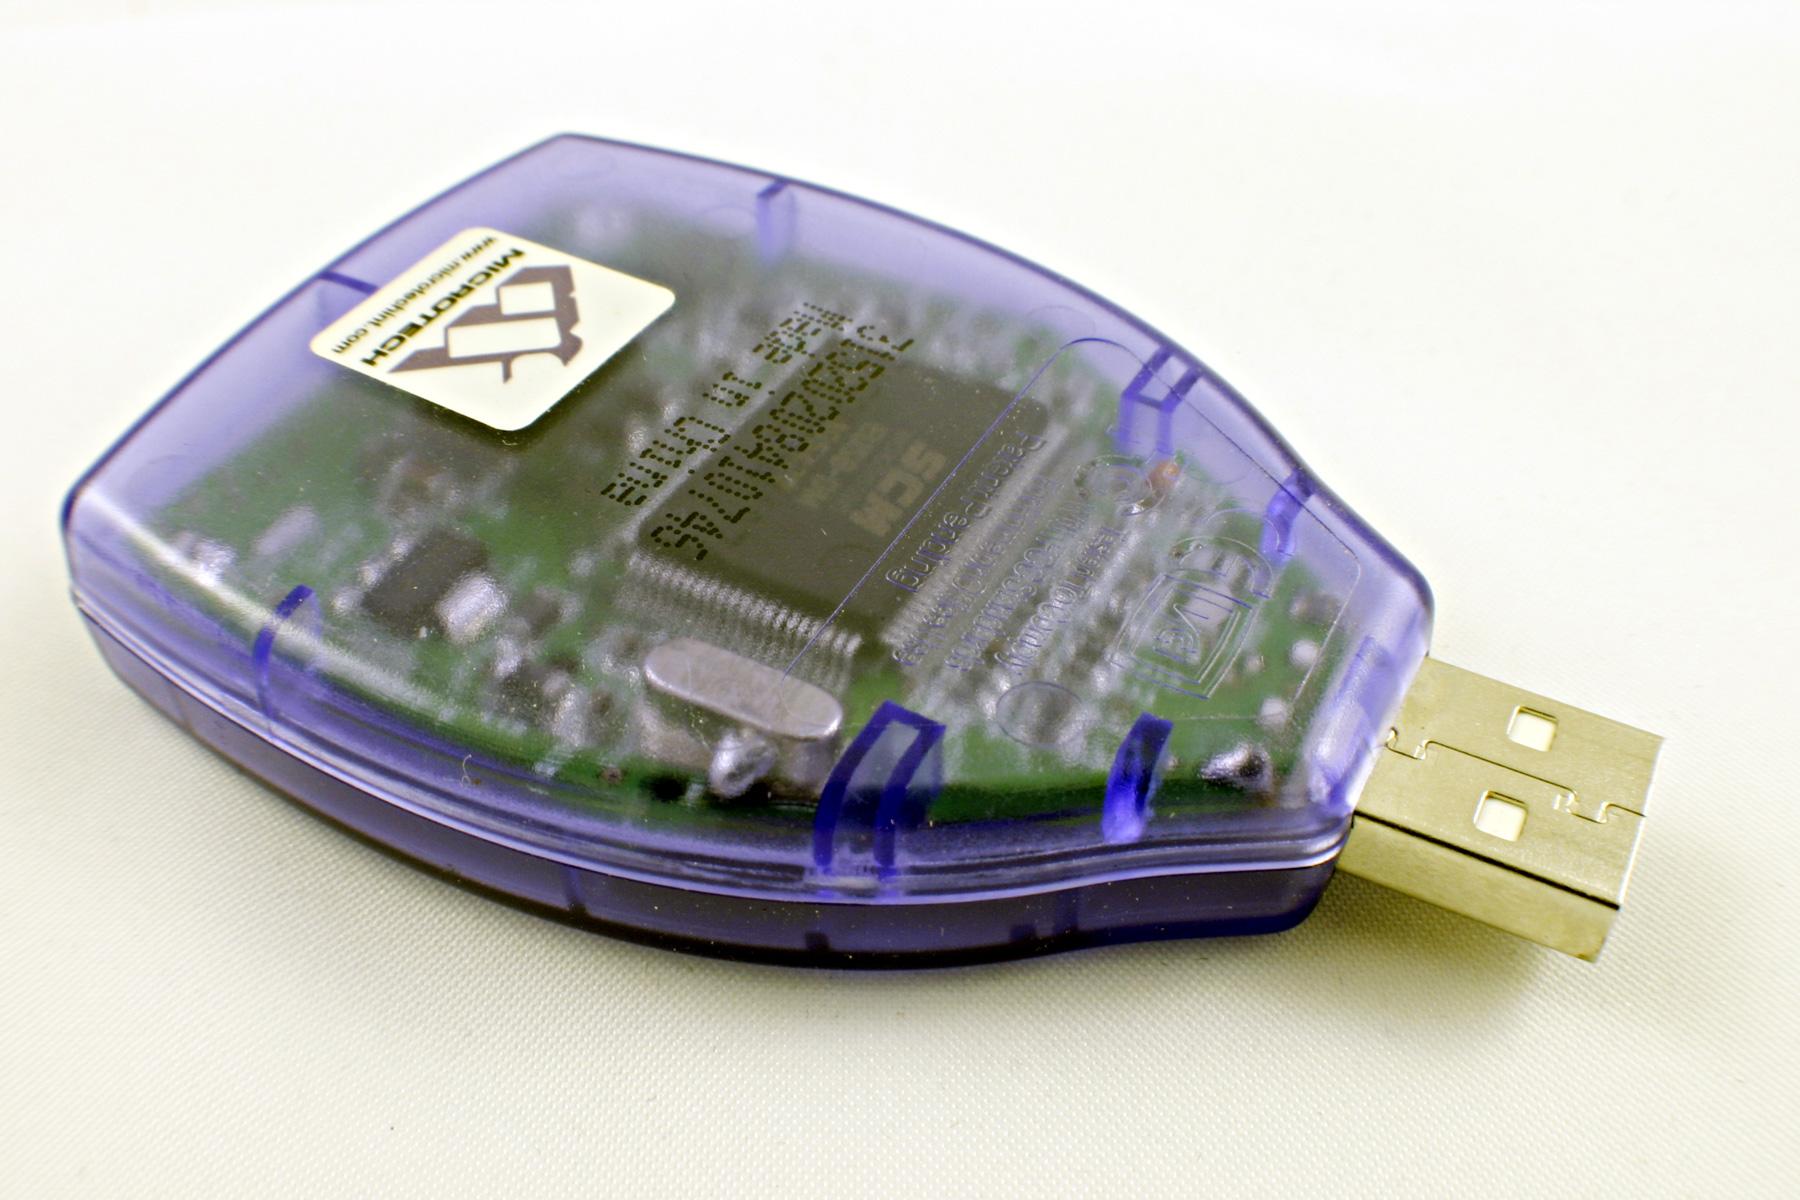 Usb memory card adapter photo